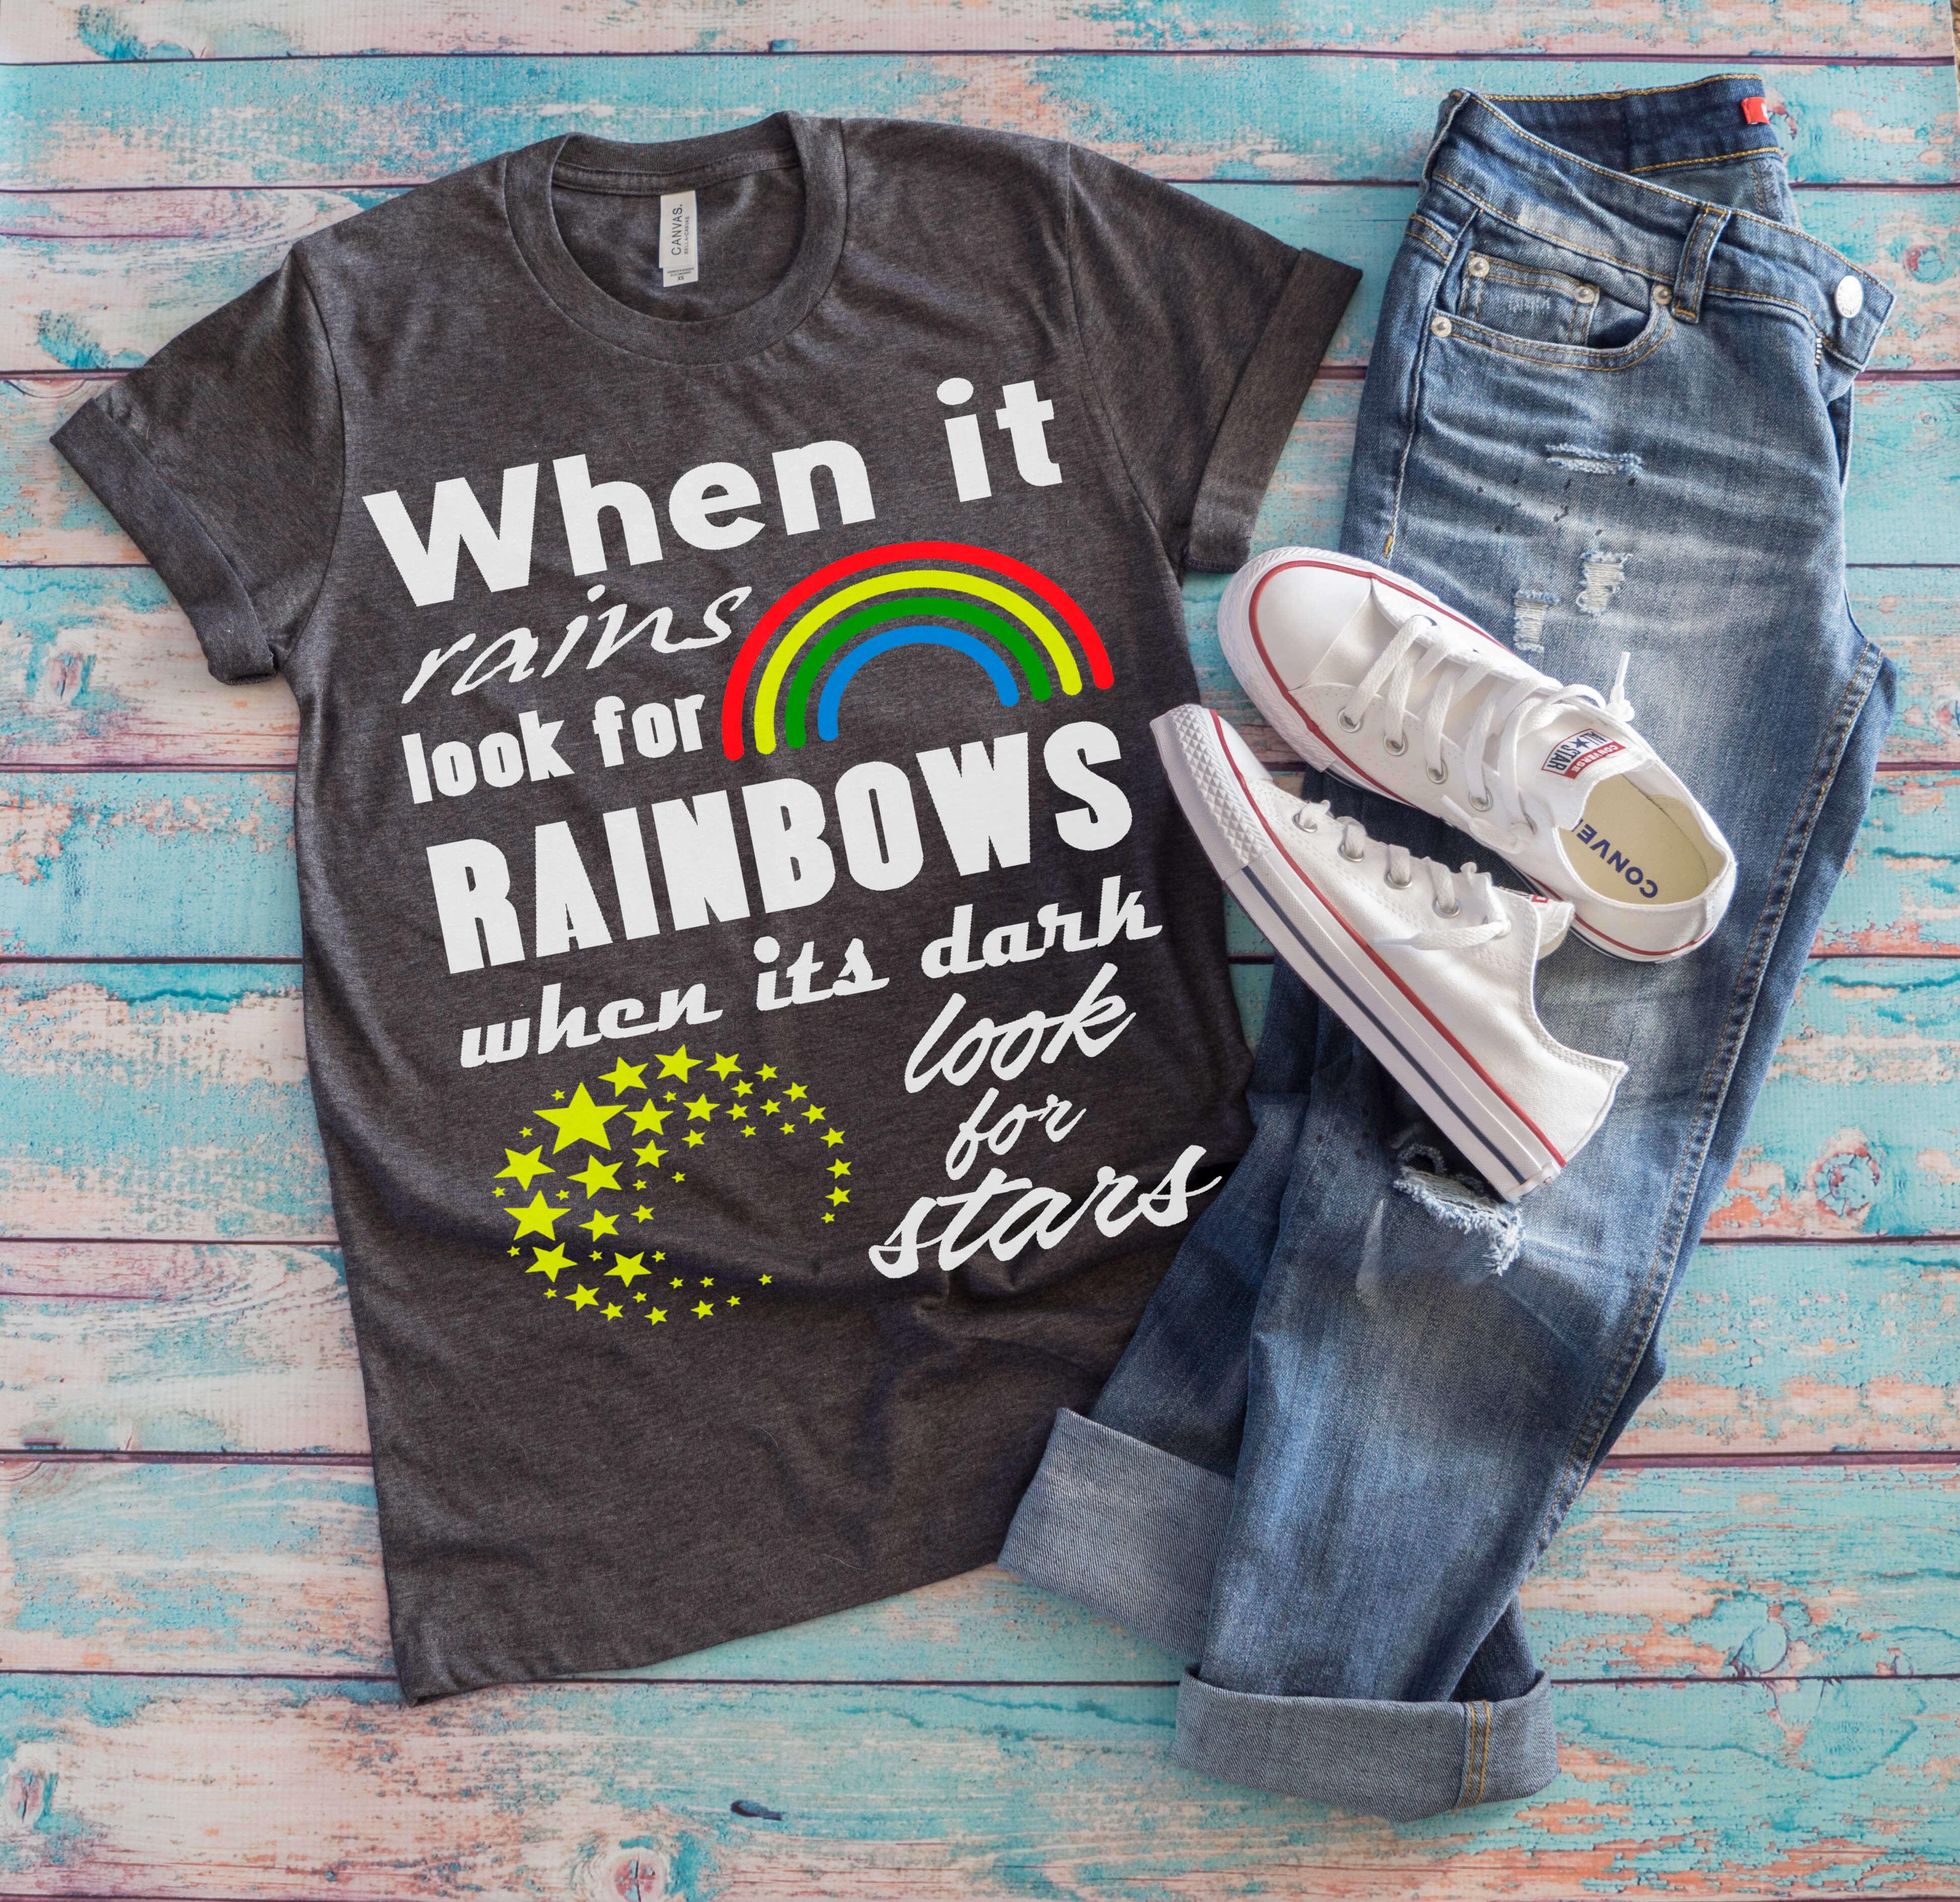 Free Rainbows and Stars SVG File